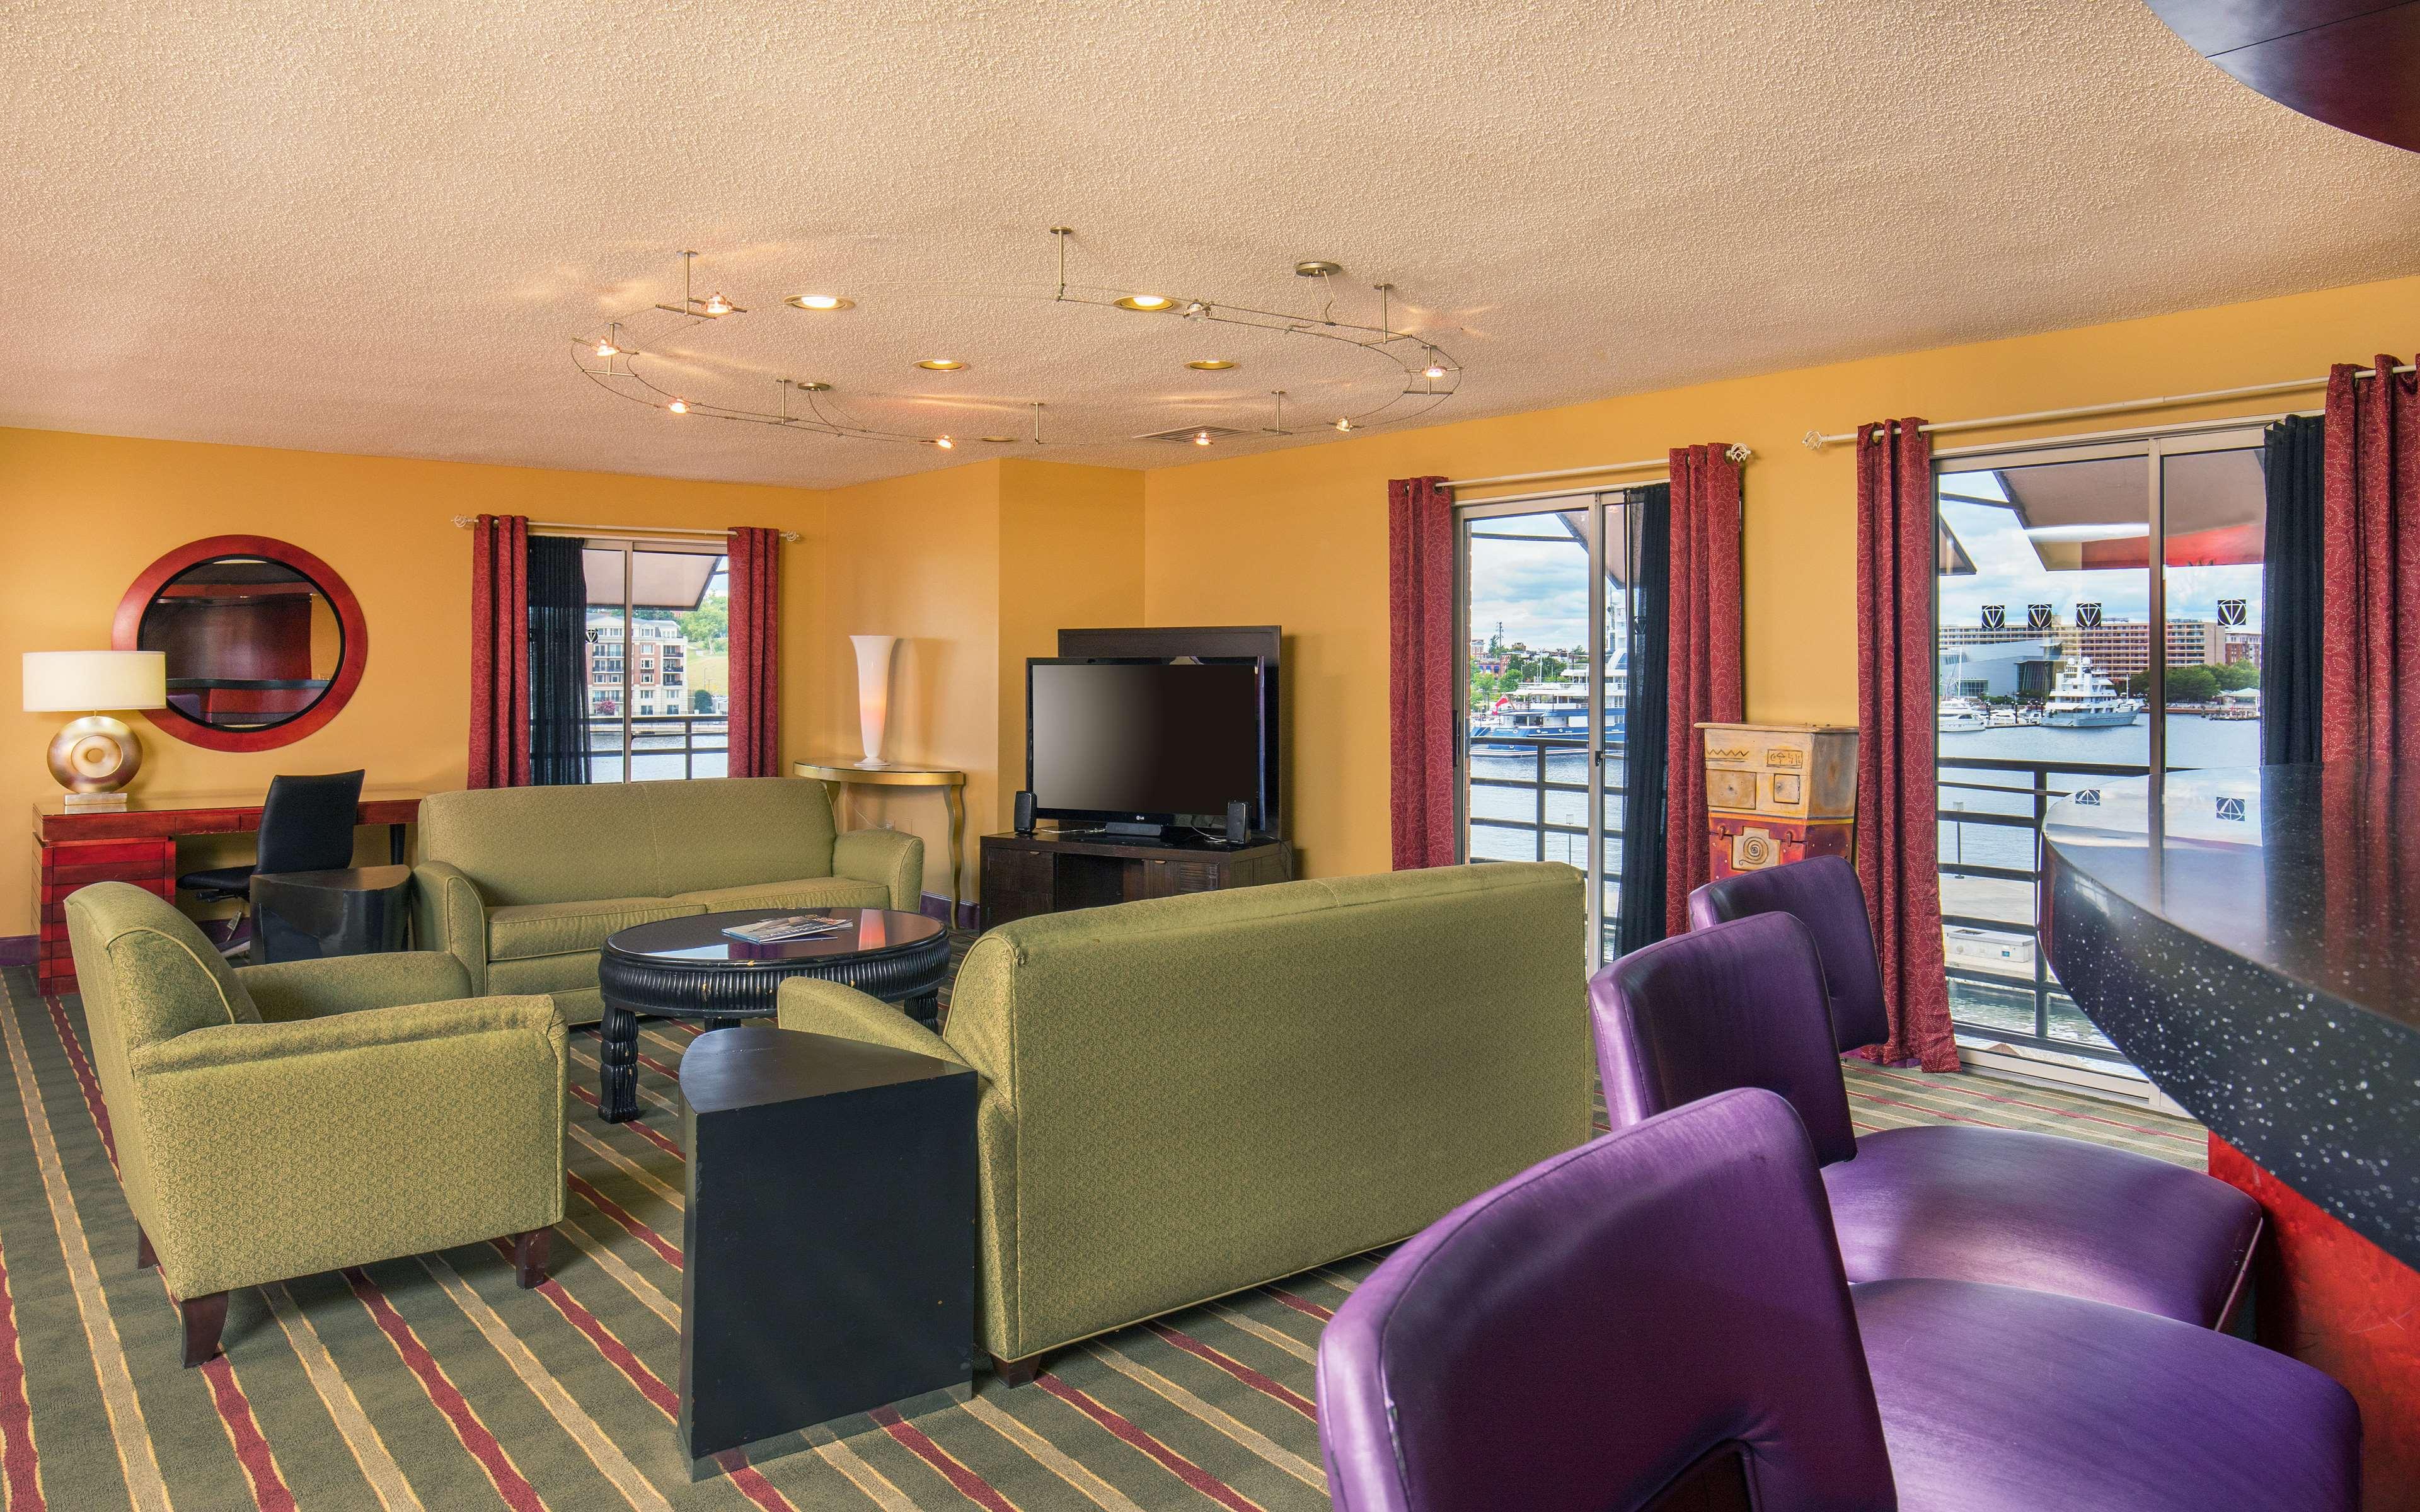 Pier 5 Hotel Baltimore, Curio Collection by Hilton image 20